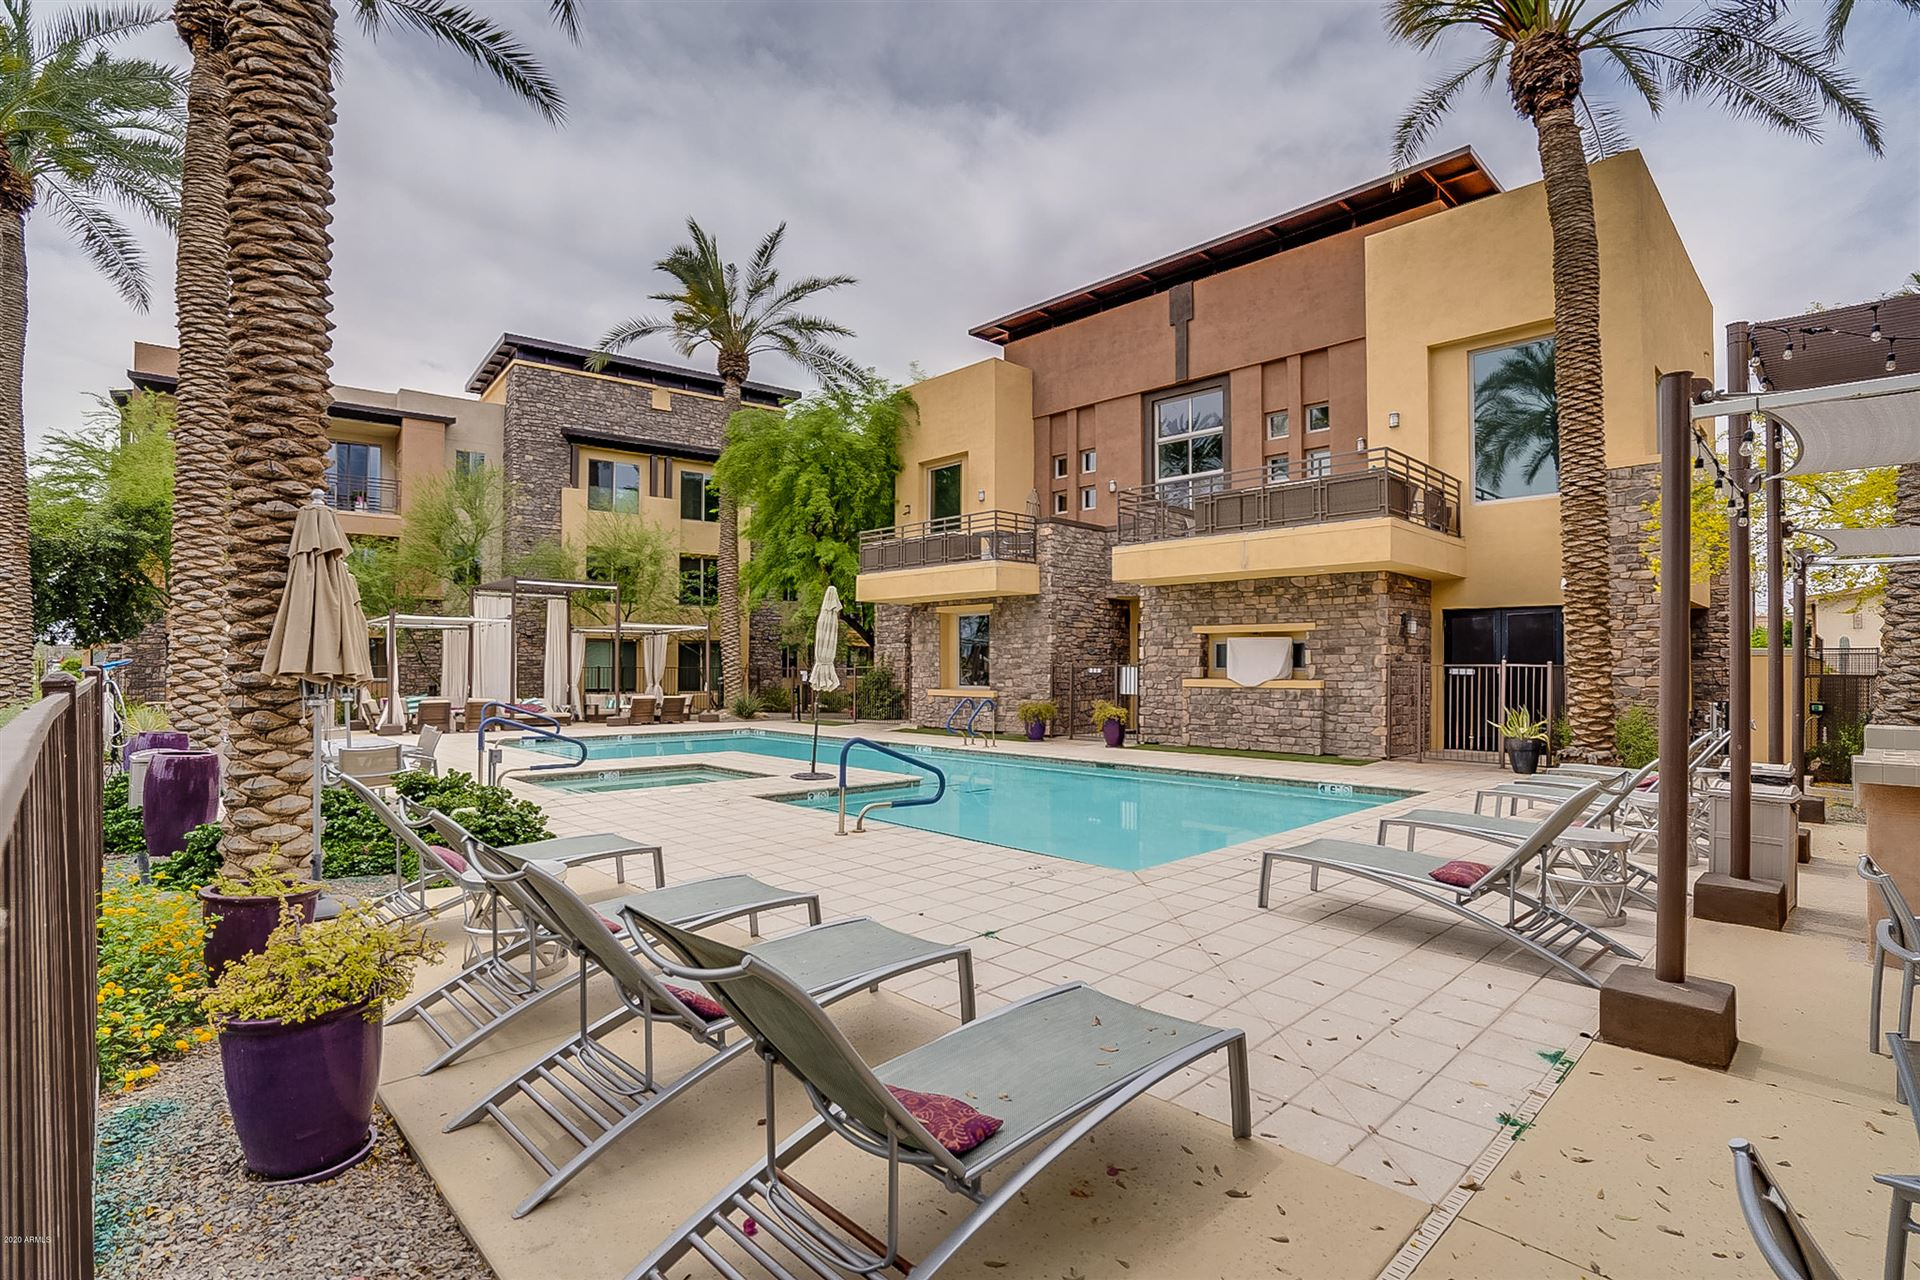 4909 N WOODMERE FAIRWAY -- #2008, Scottsdale, AZ 85251 - #: 6072965